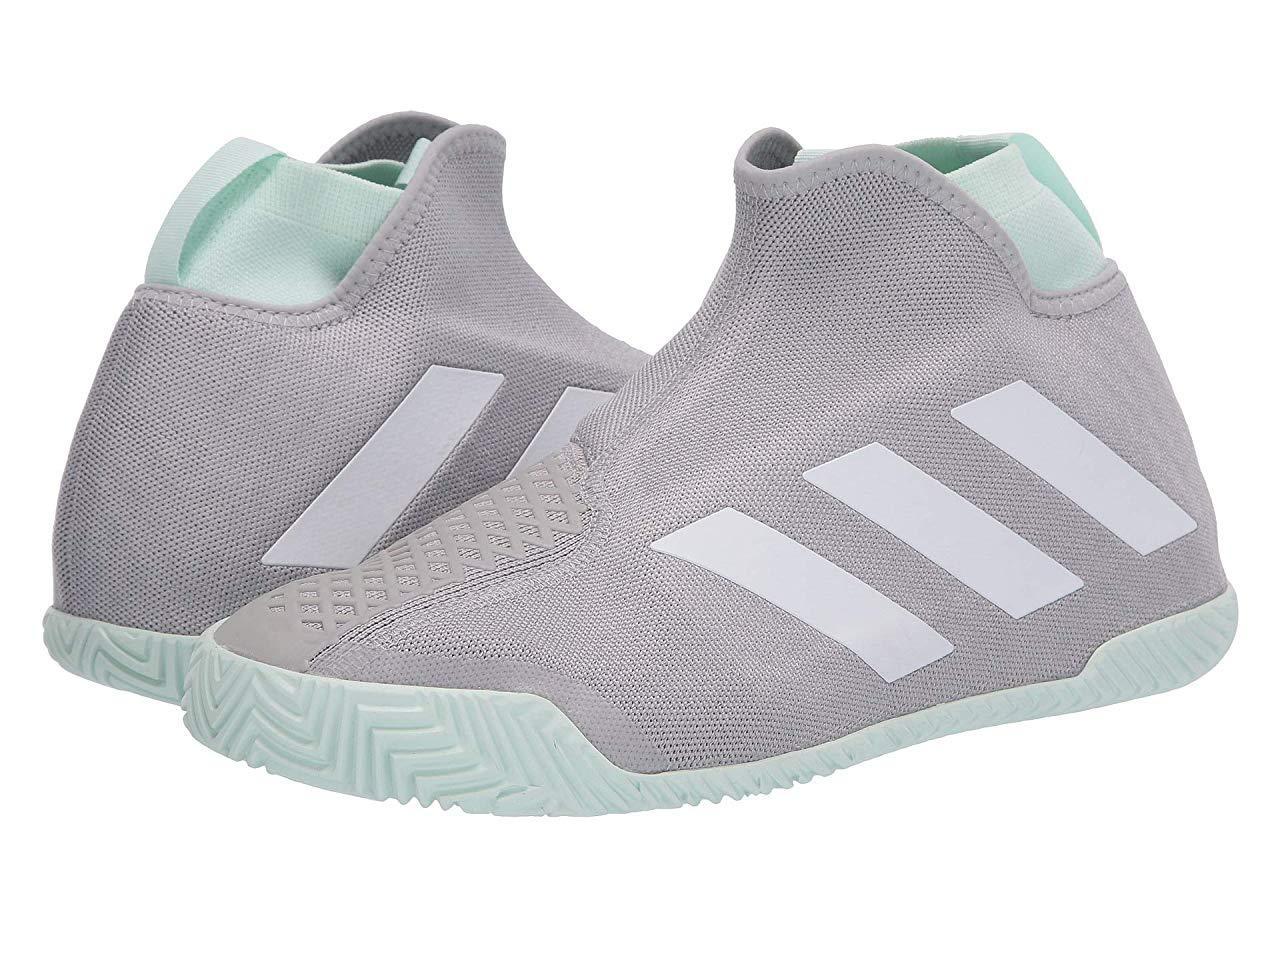 Кроссовки/Кеды adidas Stycon Grey Two/Footwear White/Dash Green